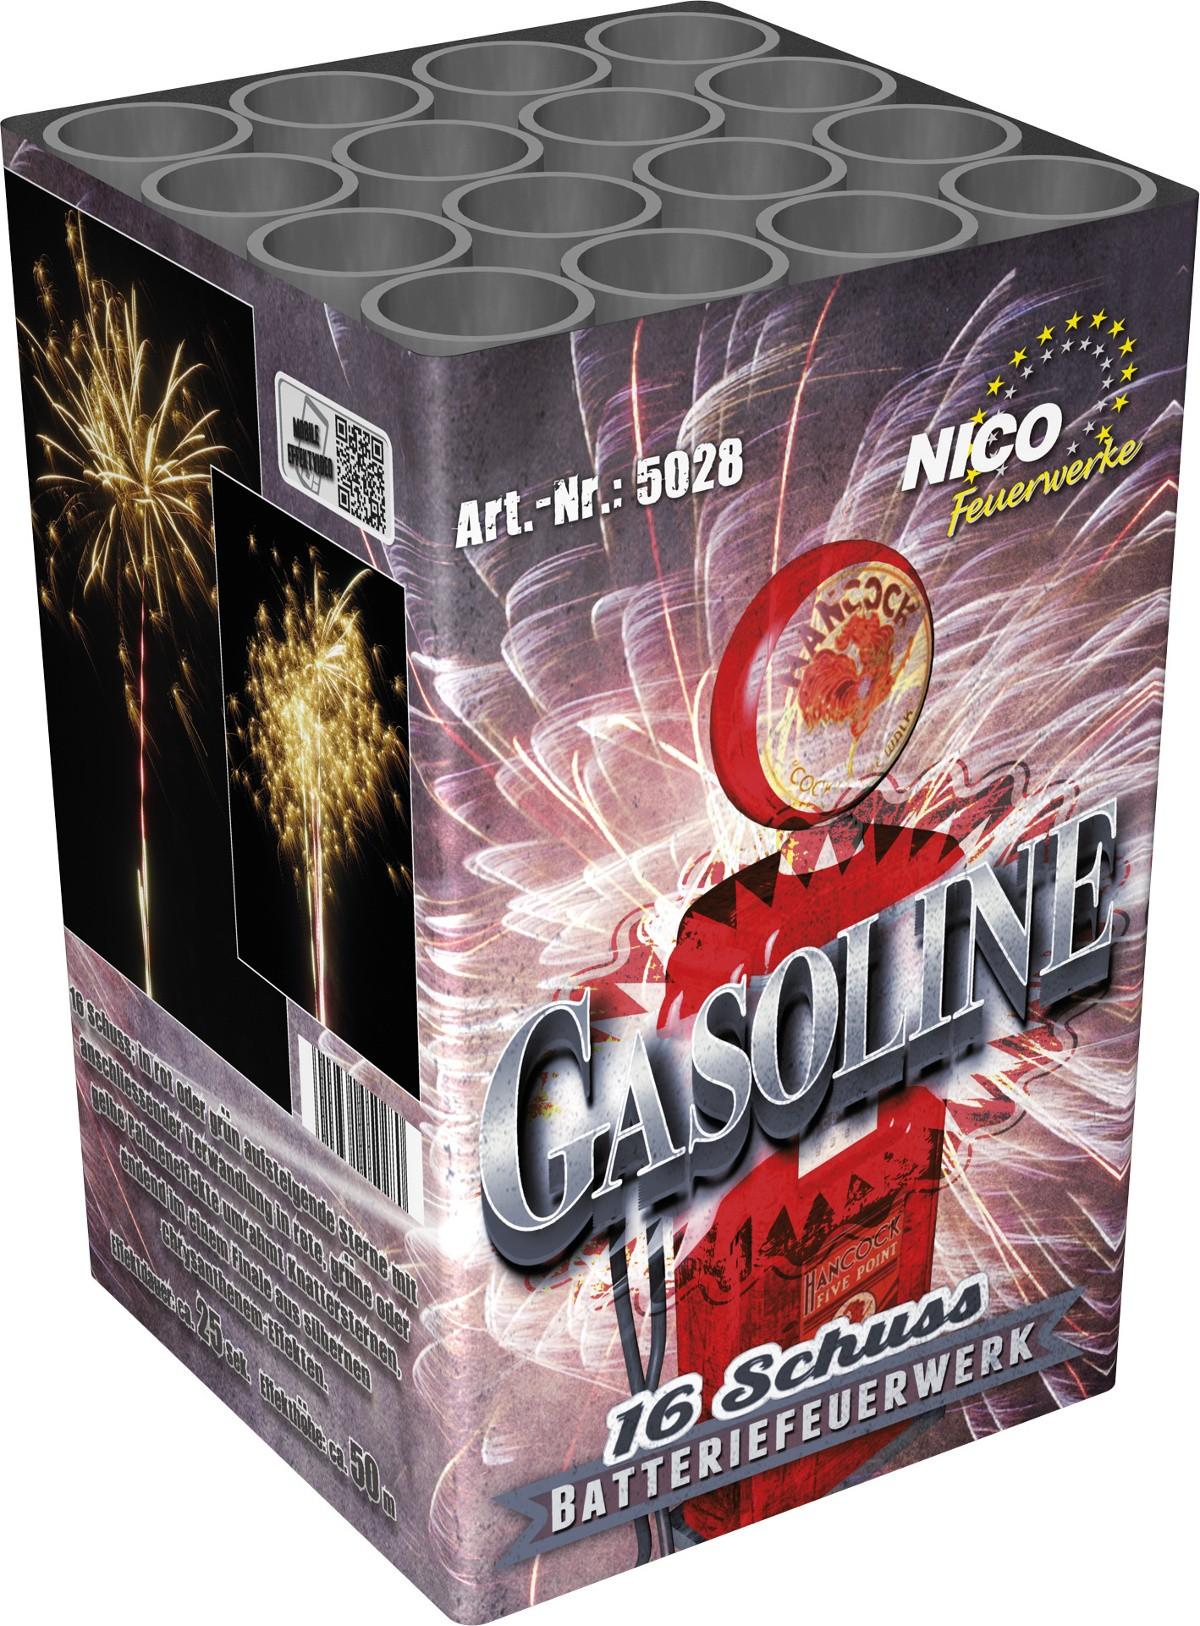 Feuerwerk Batterie 16 Schuss Casoline